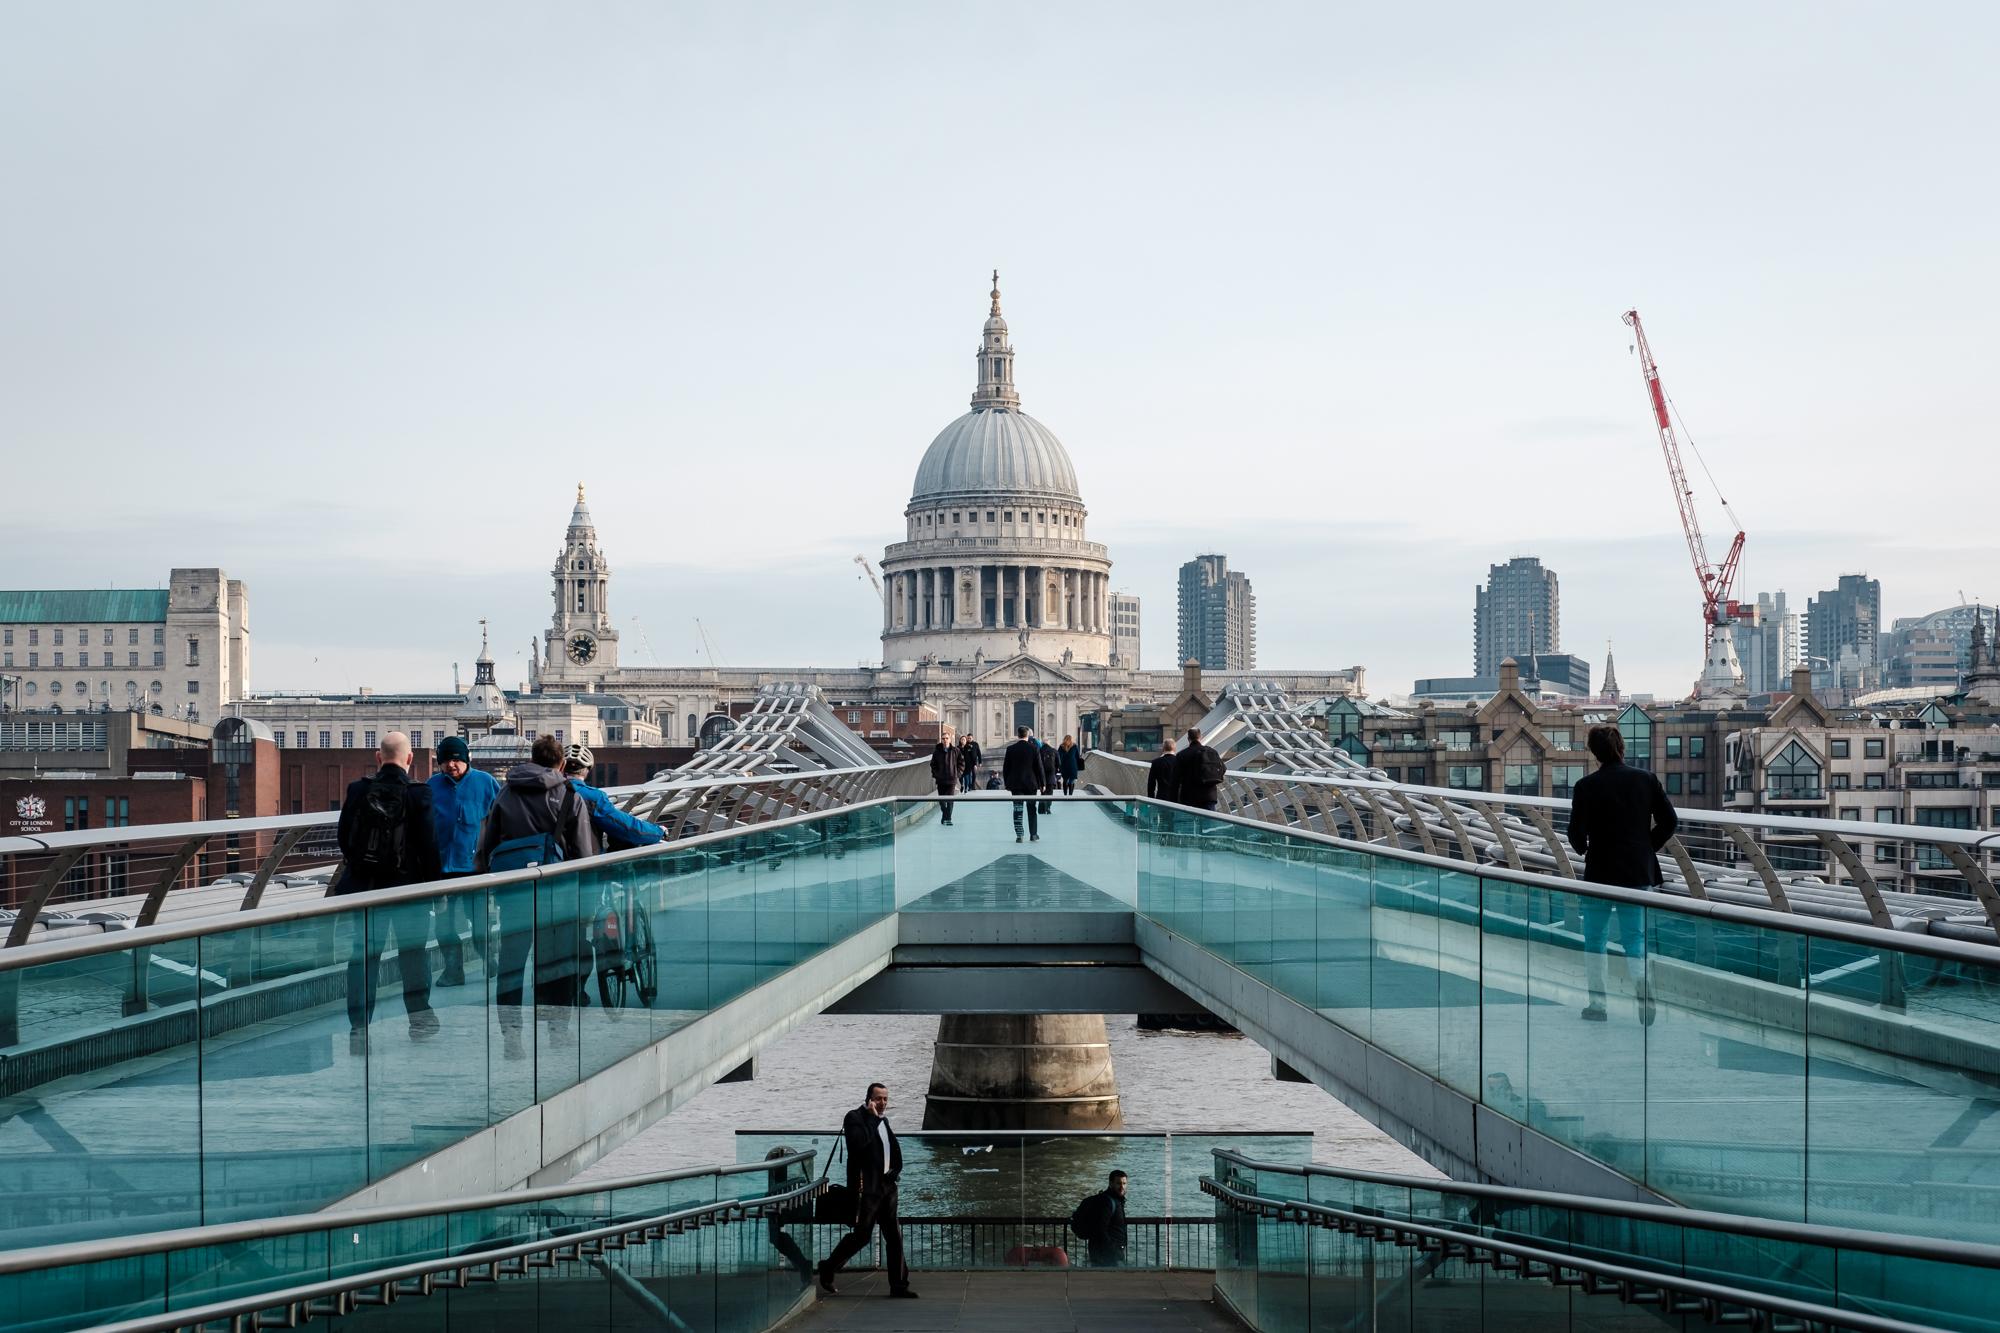 London Chrome photo of St Pauls and the Millennium Bridge taken by Trevor Sherwin